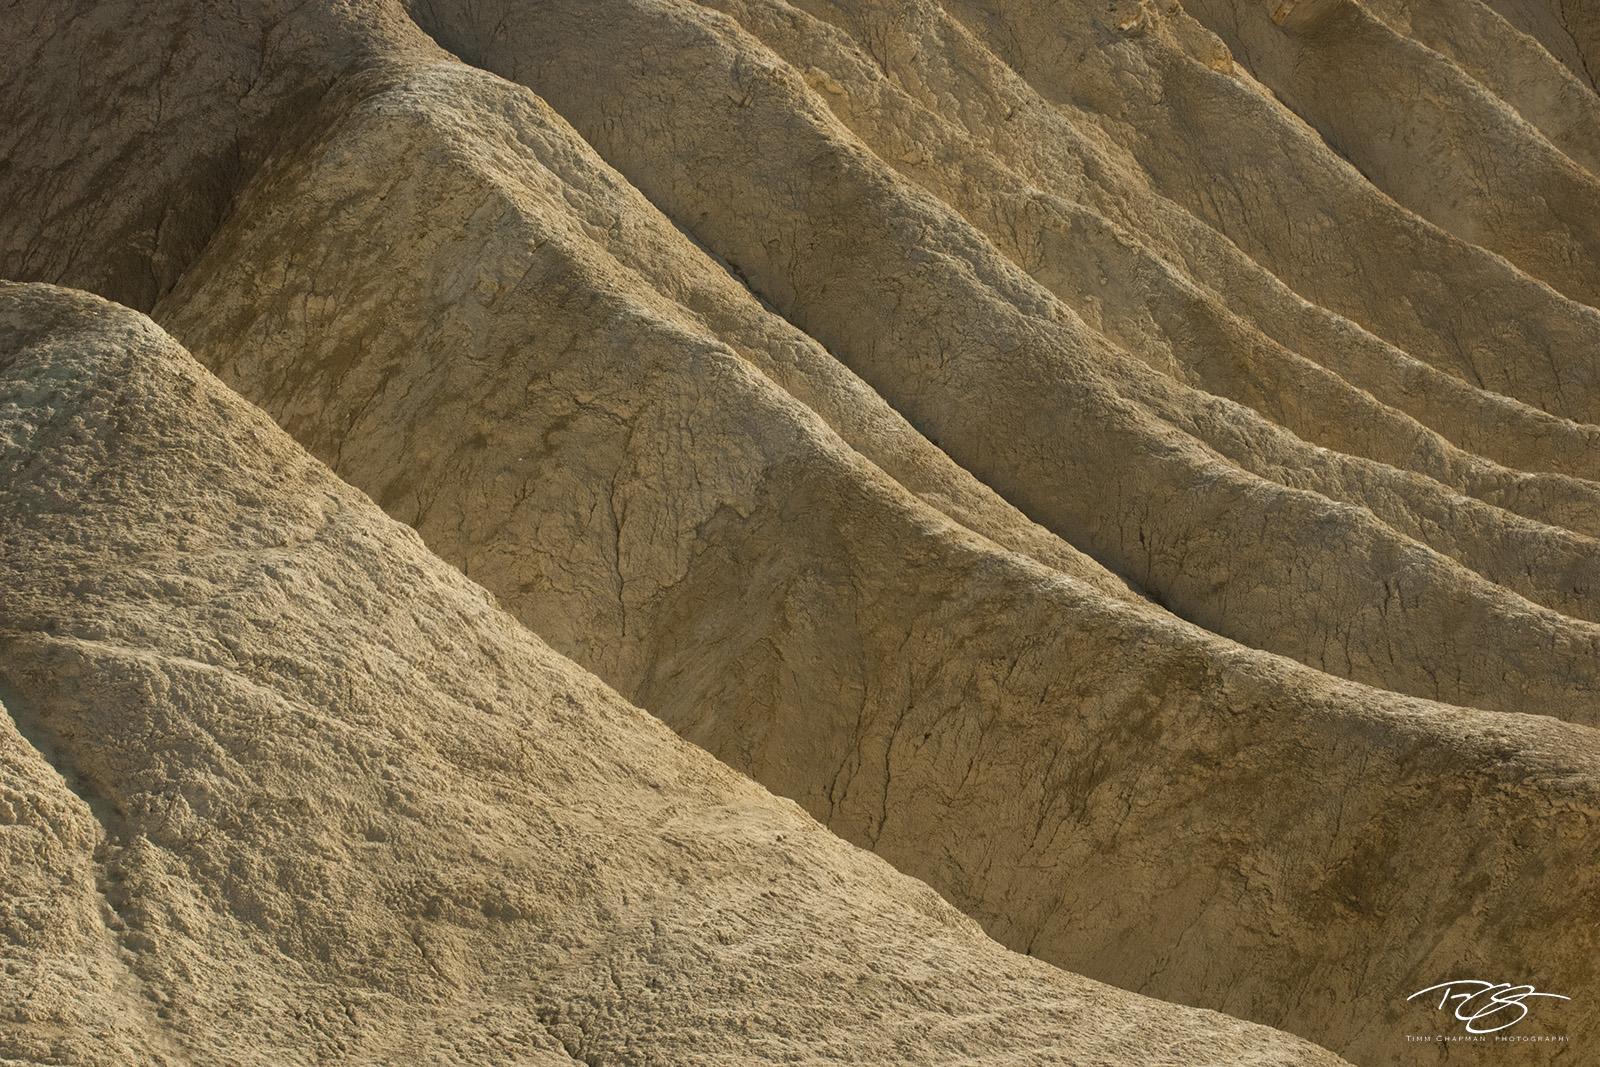 death valley, death valley, zabriske point, abstract, rock pattern, rock, patterns, beige, texture, badwater, furnace creek, photo